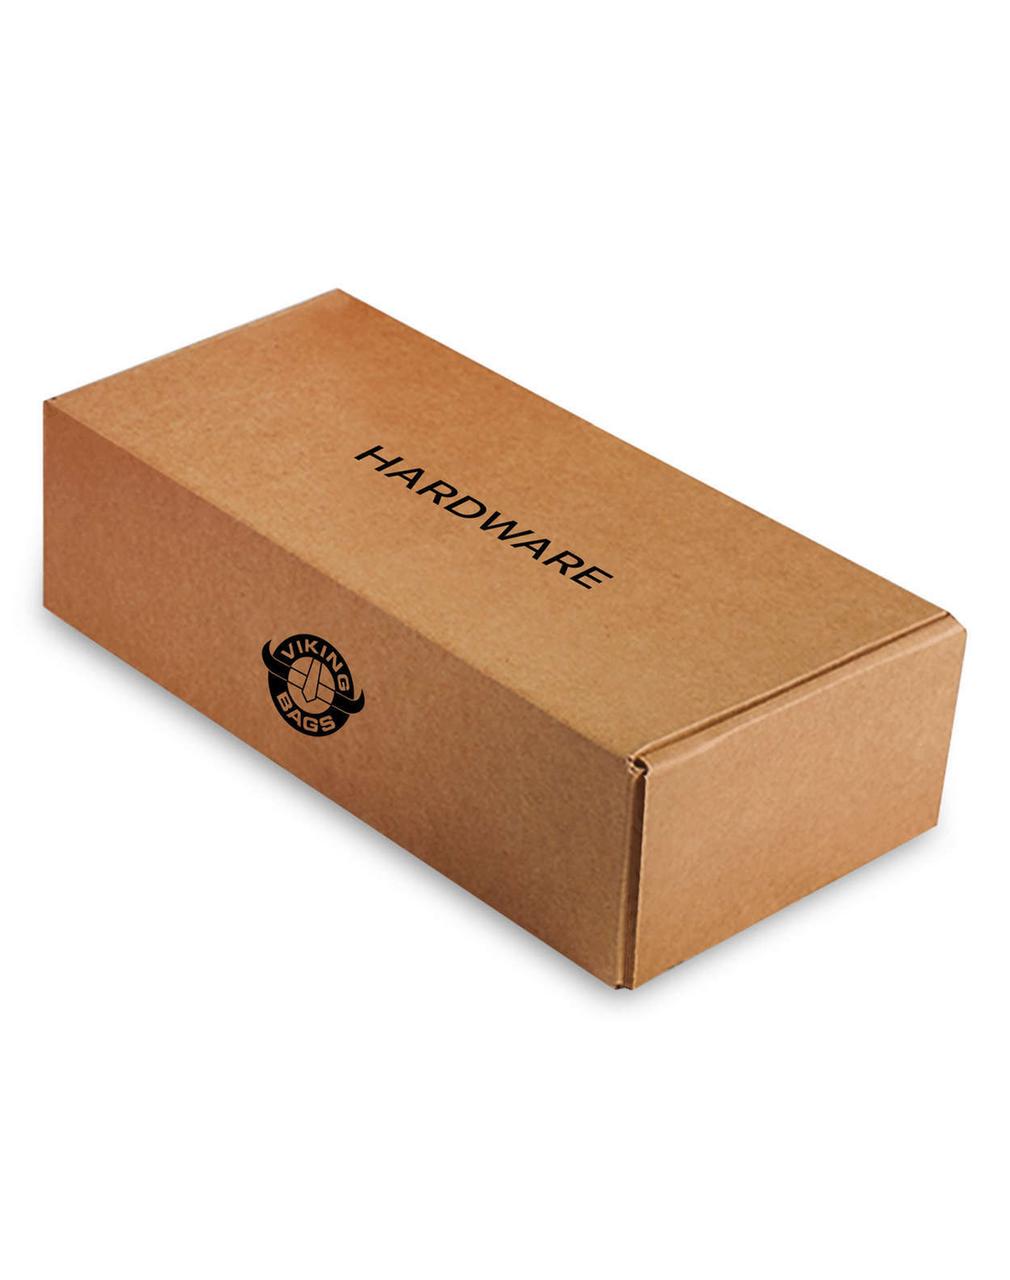 Triumph Thunderbird Warrior Slanted Medium Motorcycle Saddlebags Box